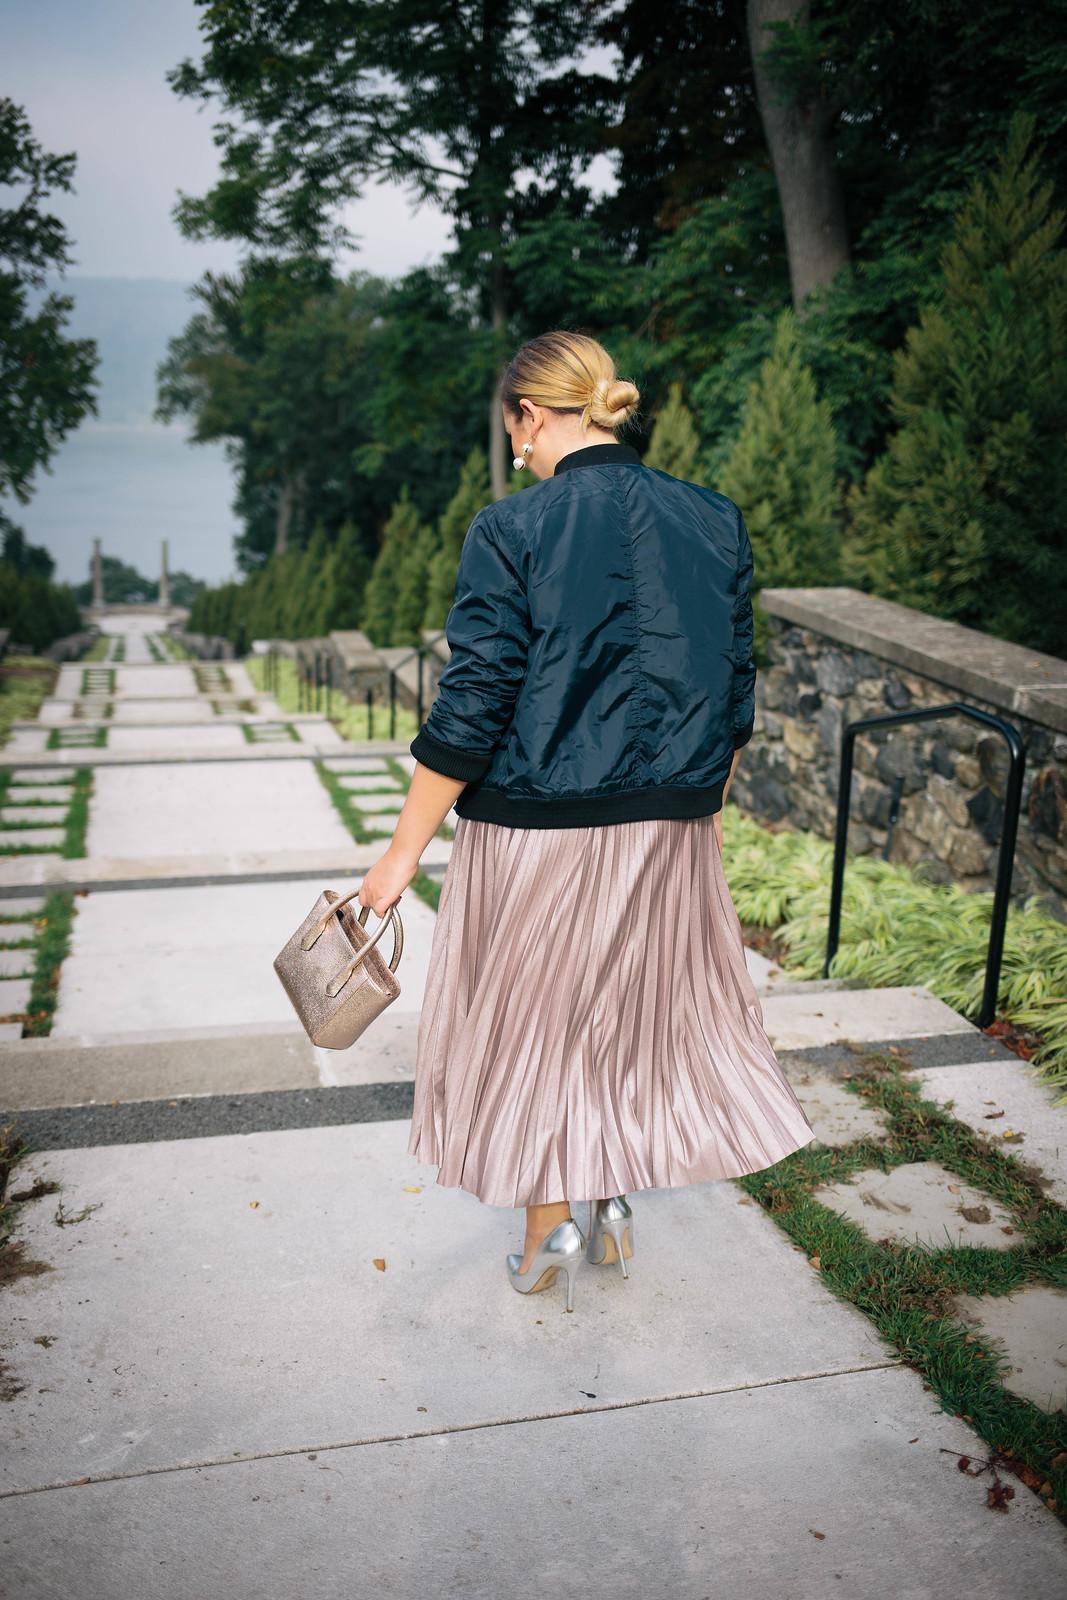 Navy Bomber Jacket Metallic Blush Pleated Midi Skirt Silver Heels Pearl Earrings Low Blonde Hair Bun Untermyer Park Yonkers NY